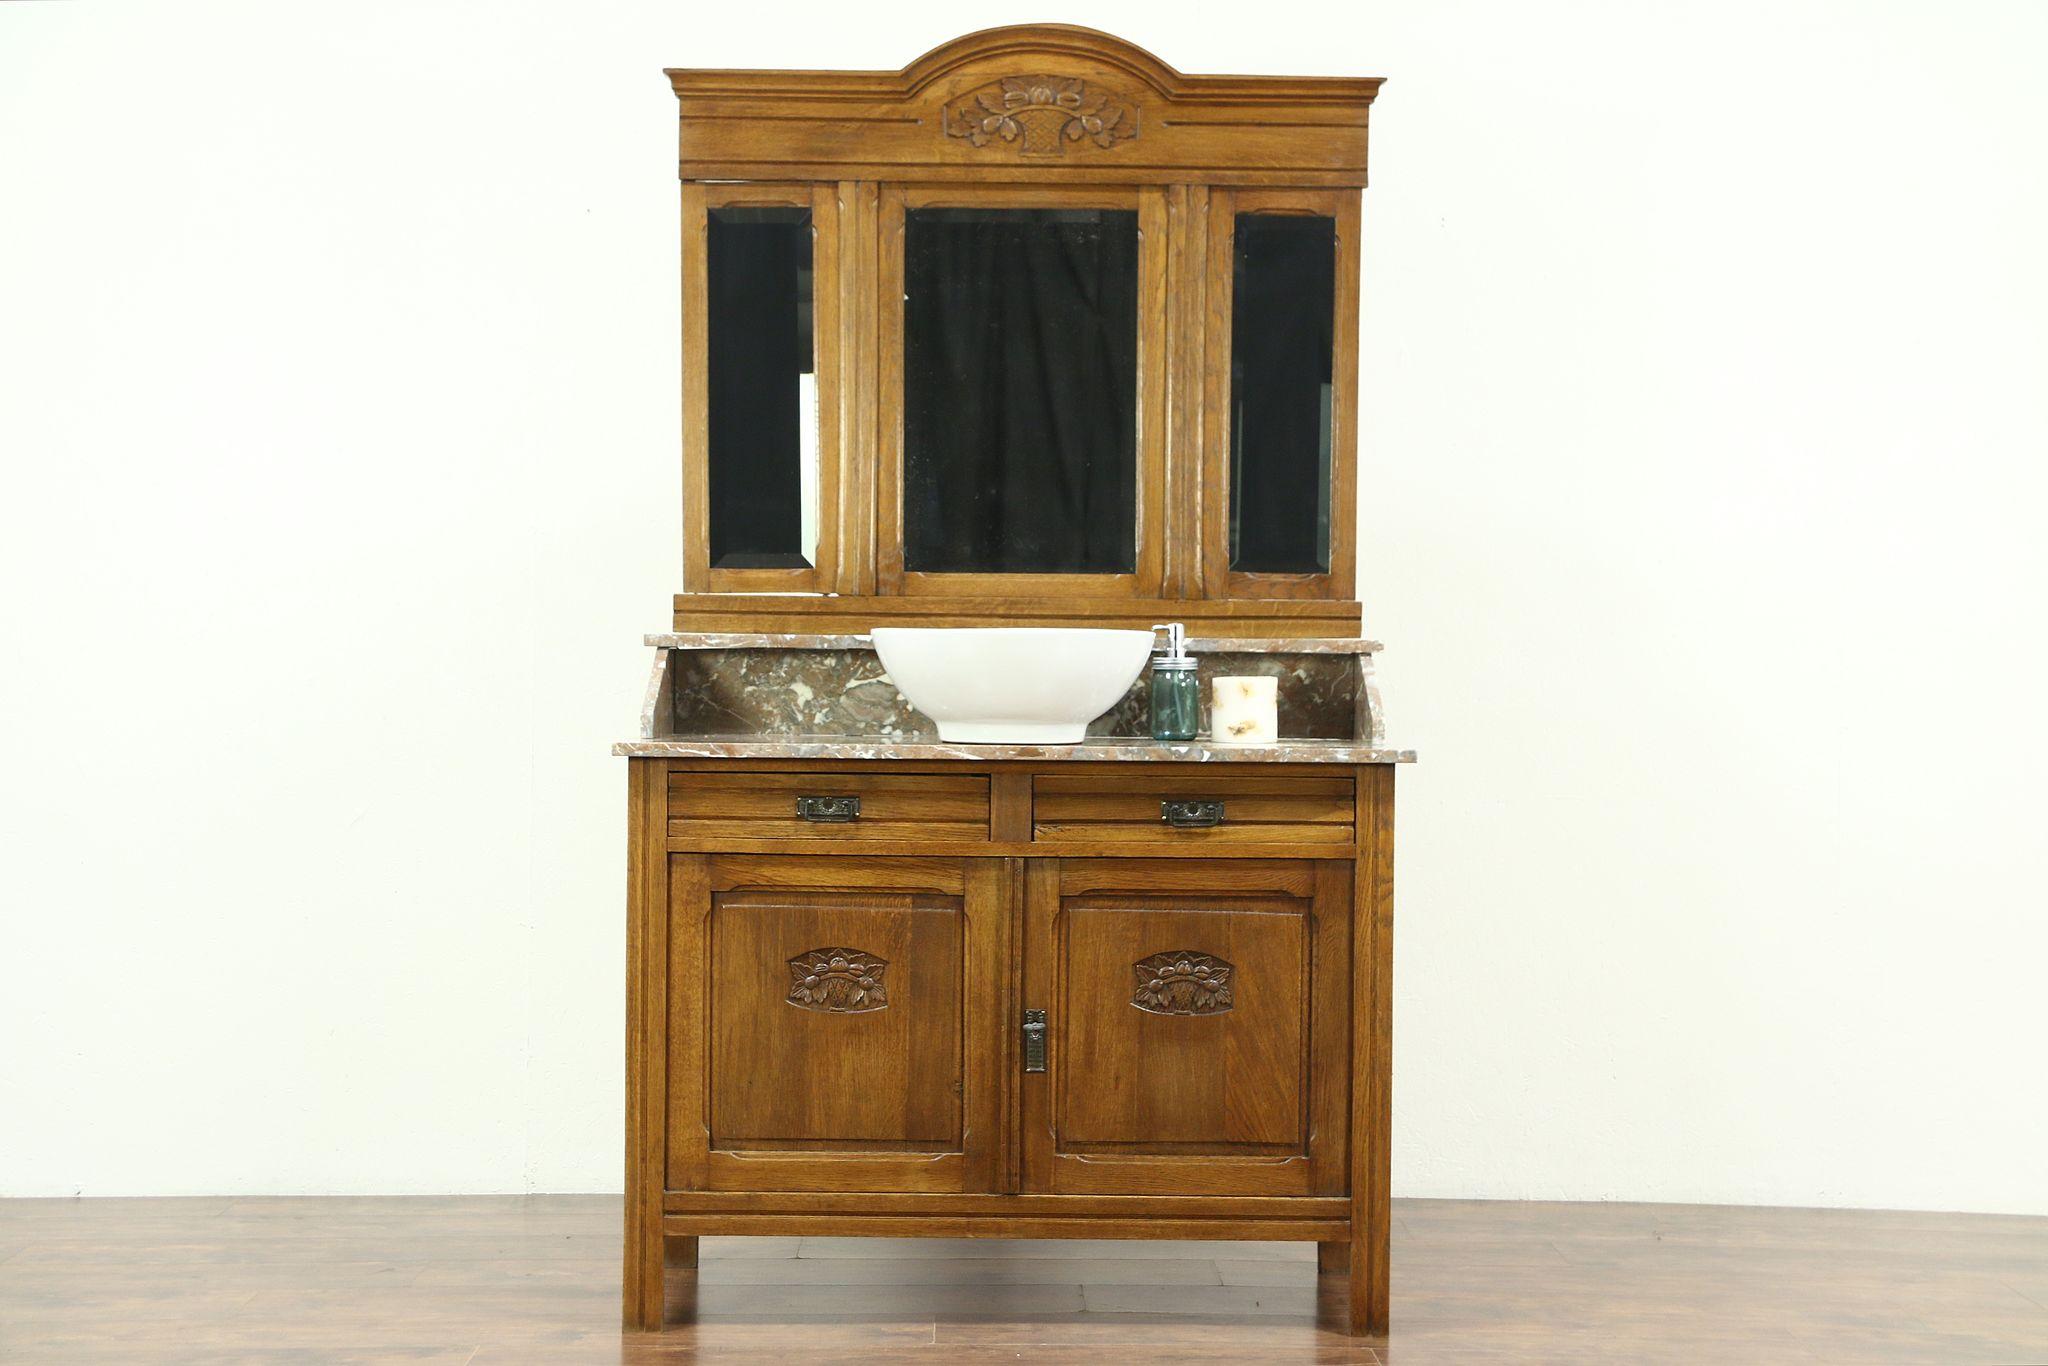 Oak U0026 Marble Top Antique Washstand, Bar, Vessel Sink Vanity, Beveled  Mirrors ...